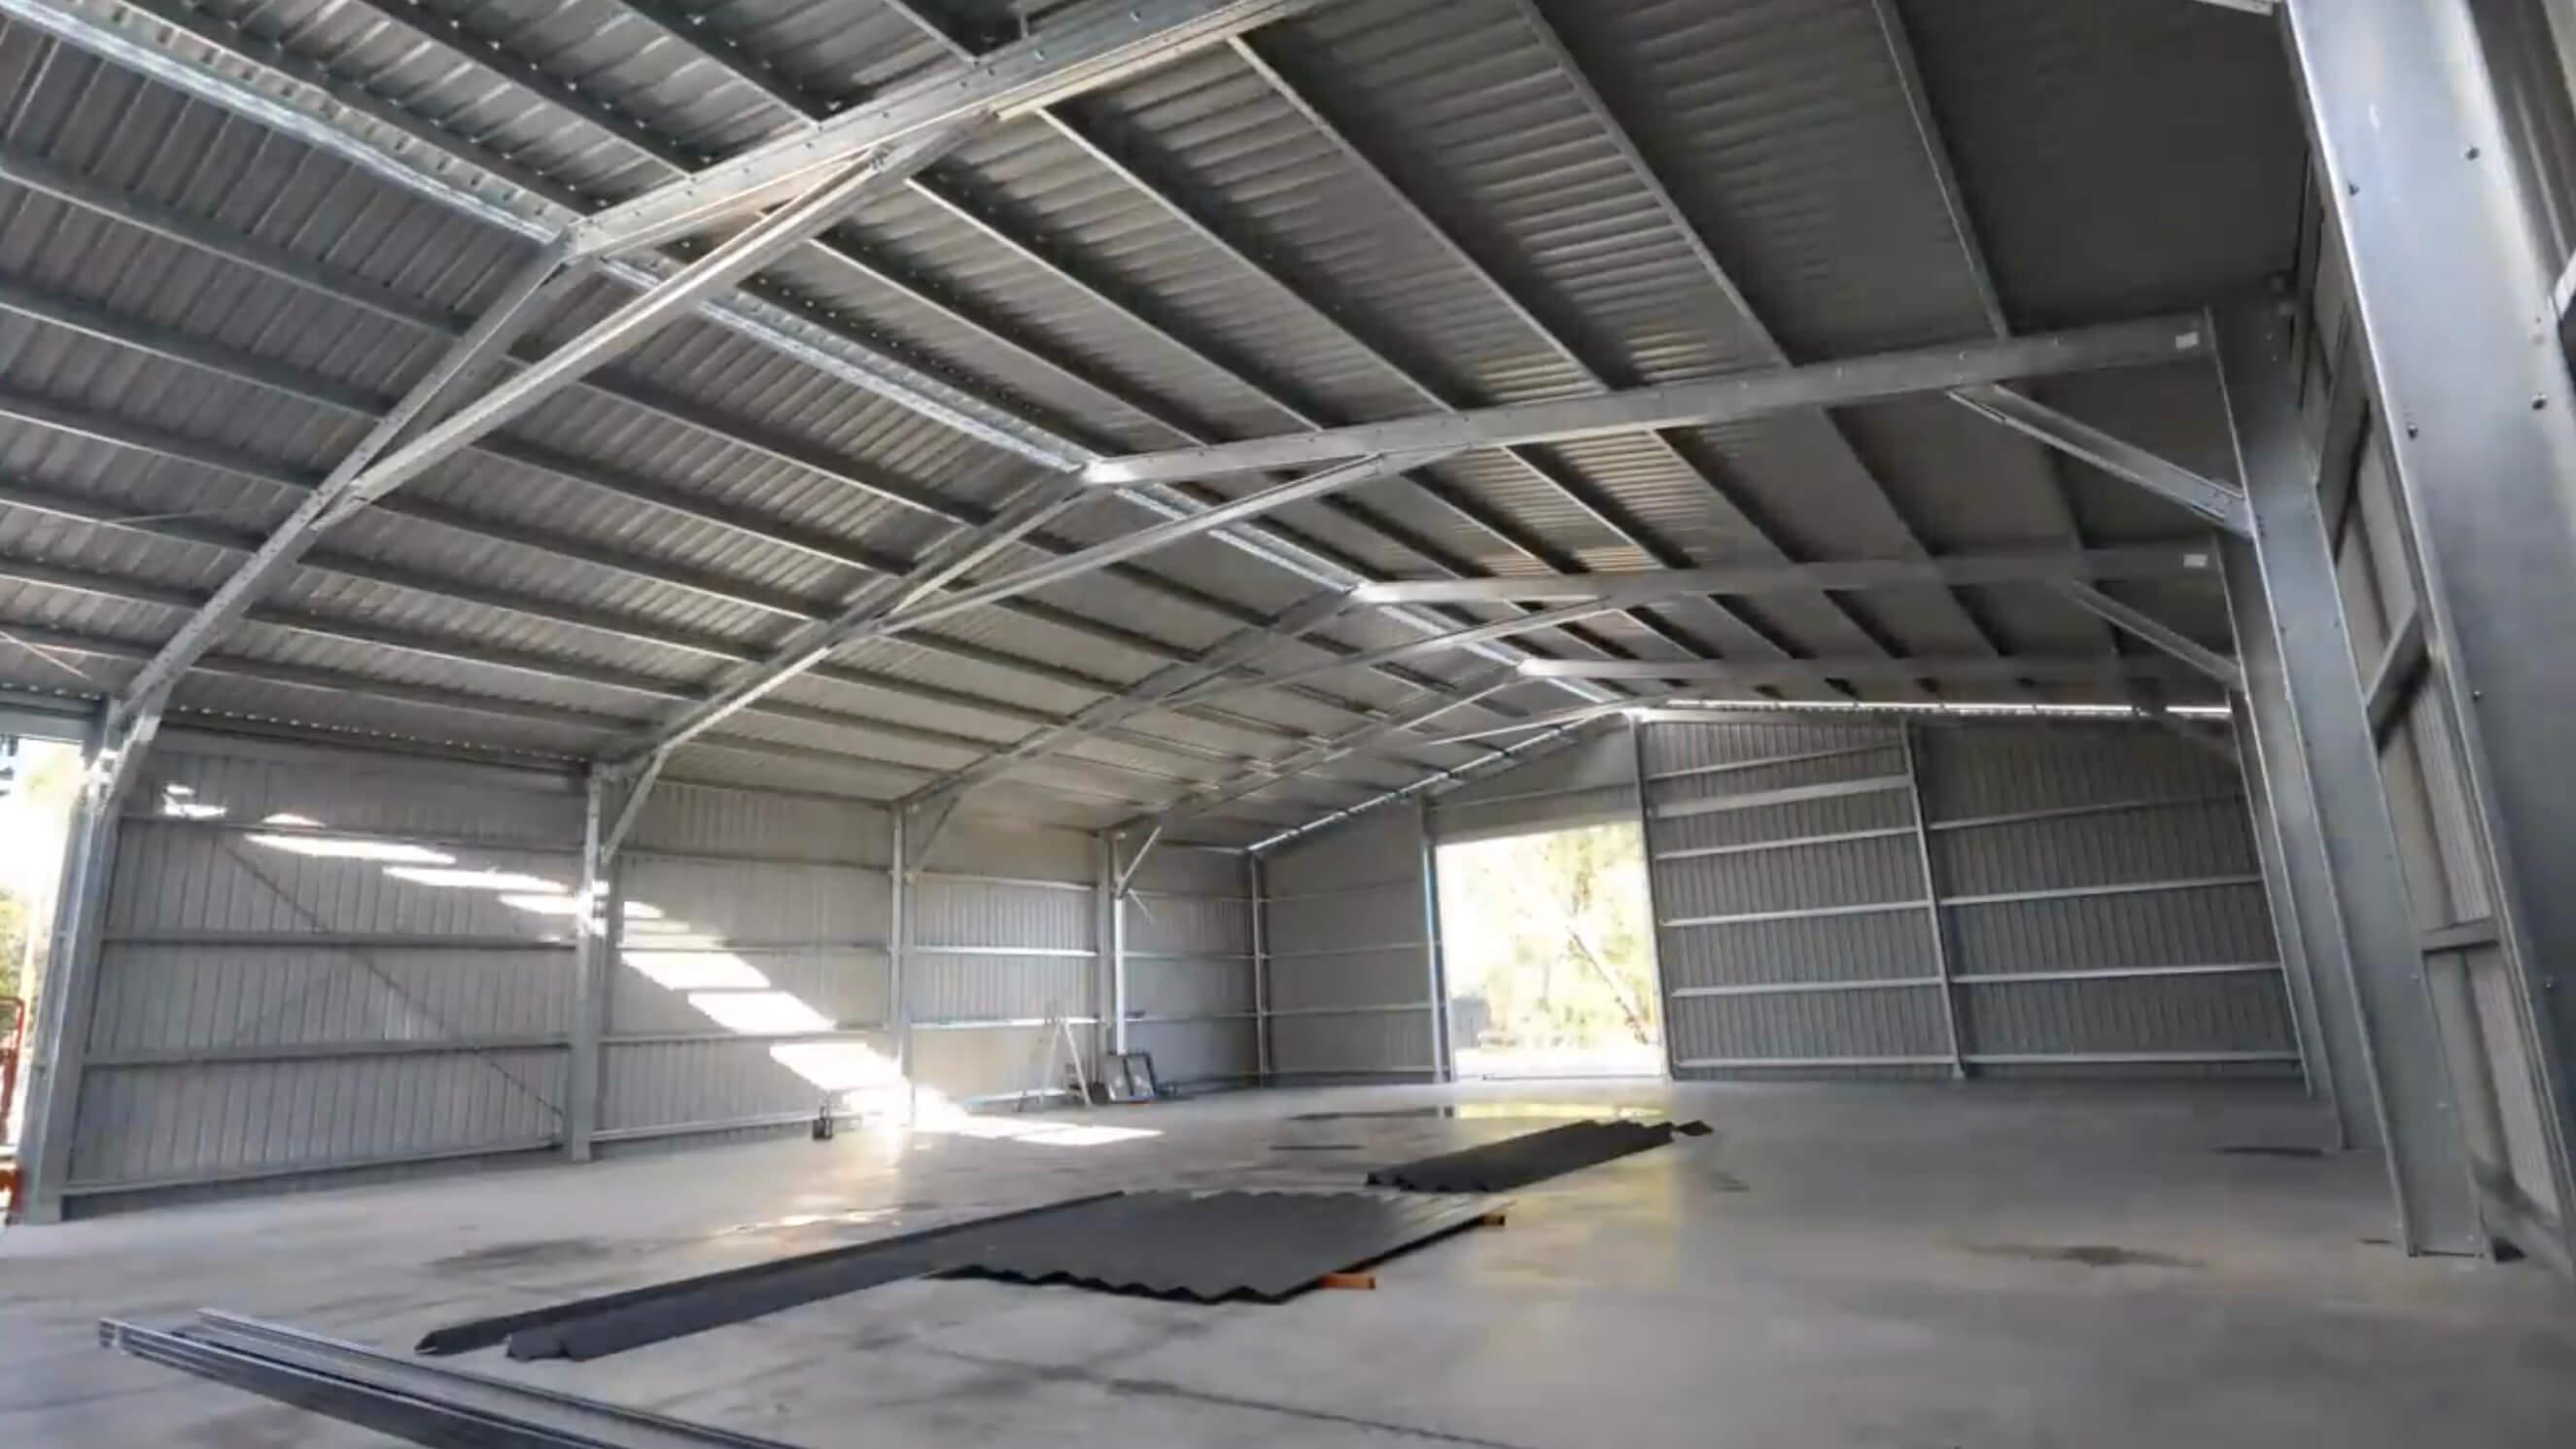 24m x 18m x 5m SHED in Australia - BDN Fasteners built using steel stud framing screws 2